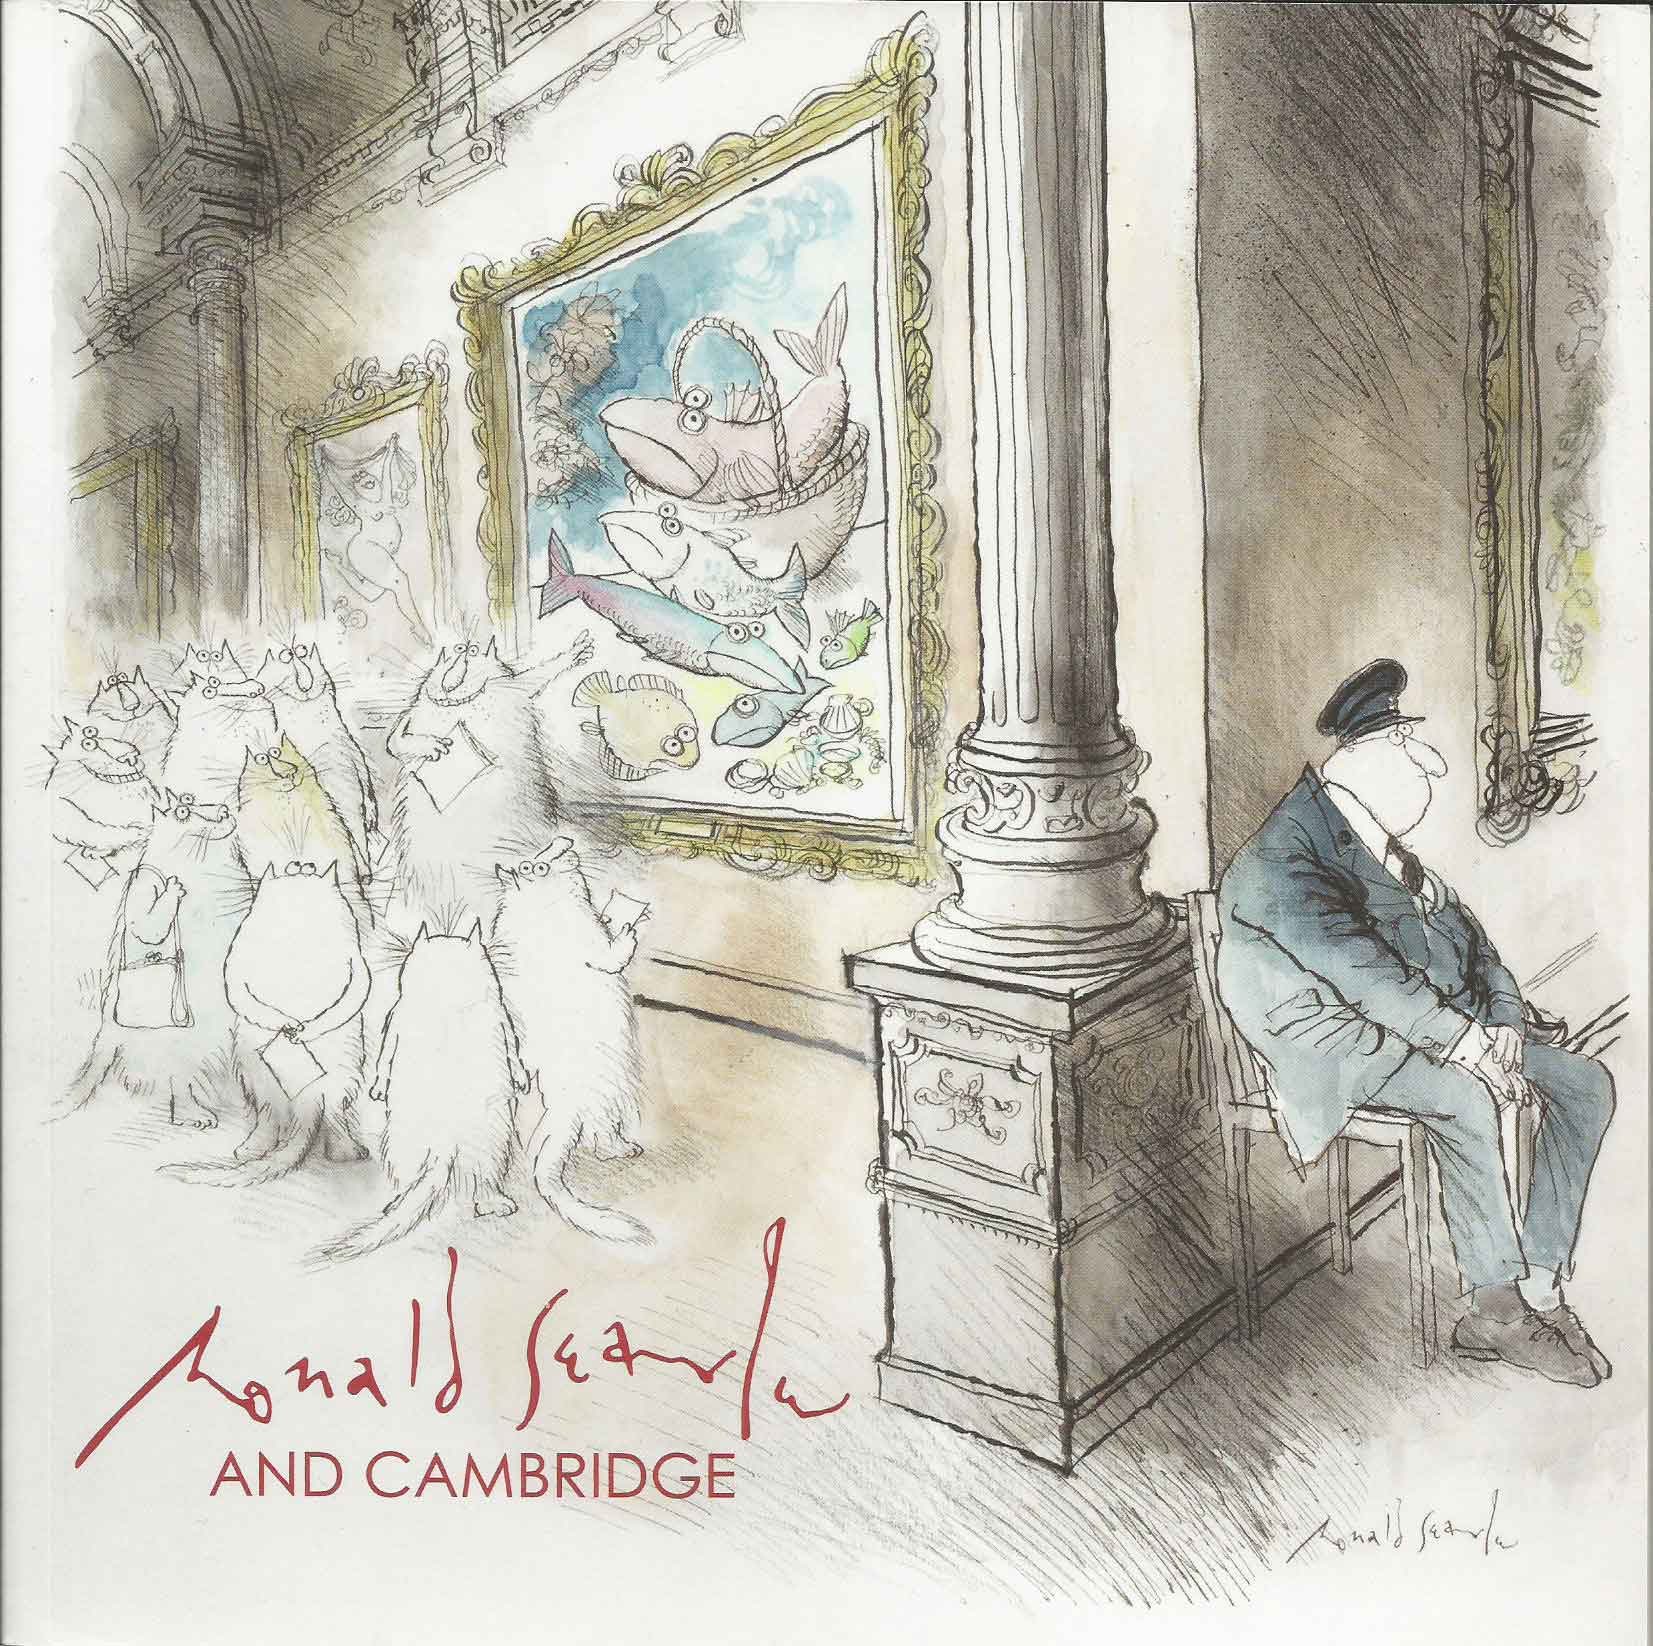 Ronald Searle and Cambridge cover